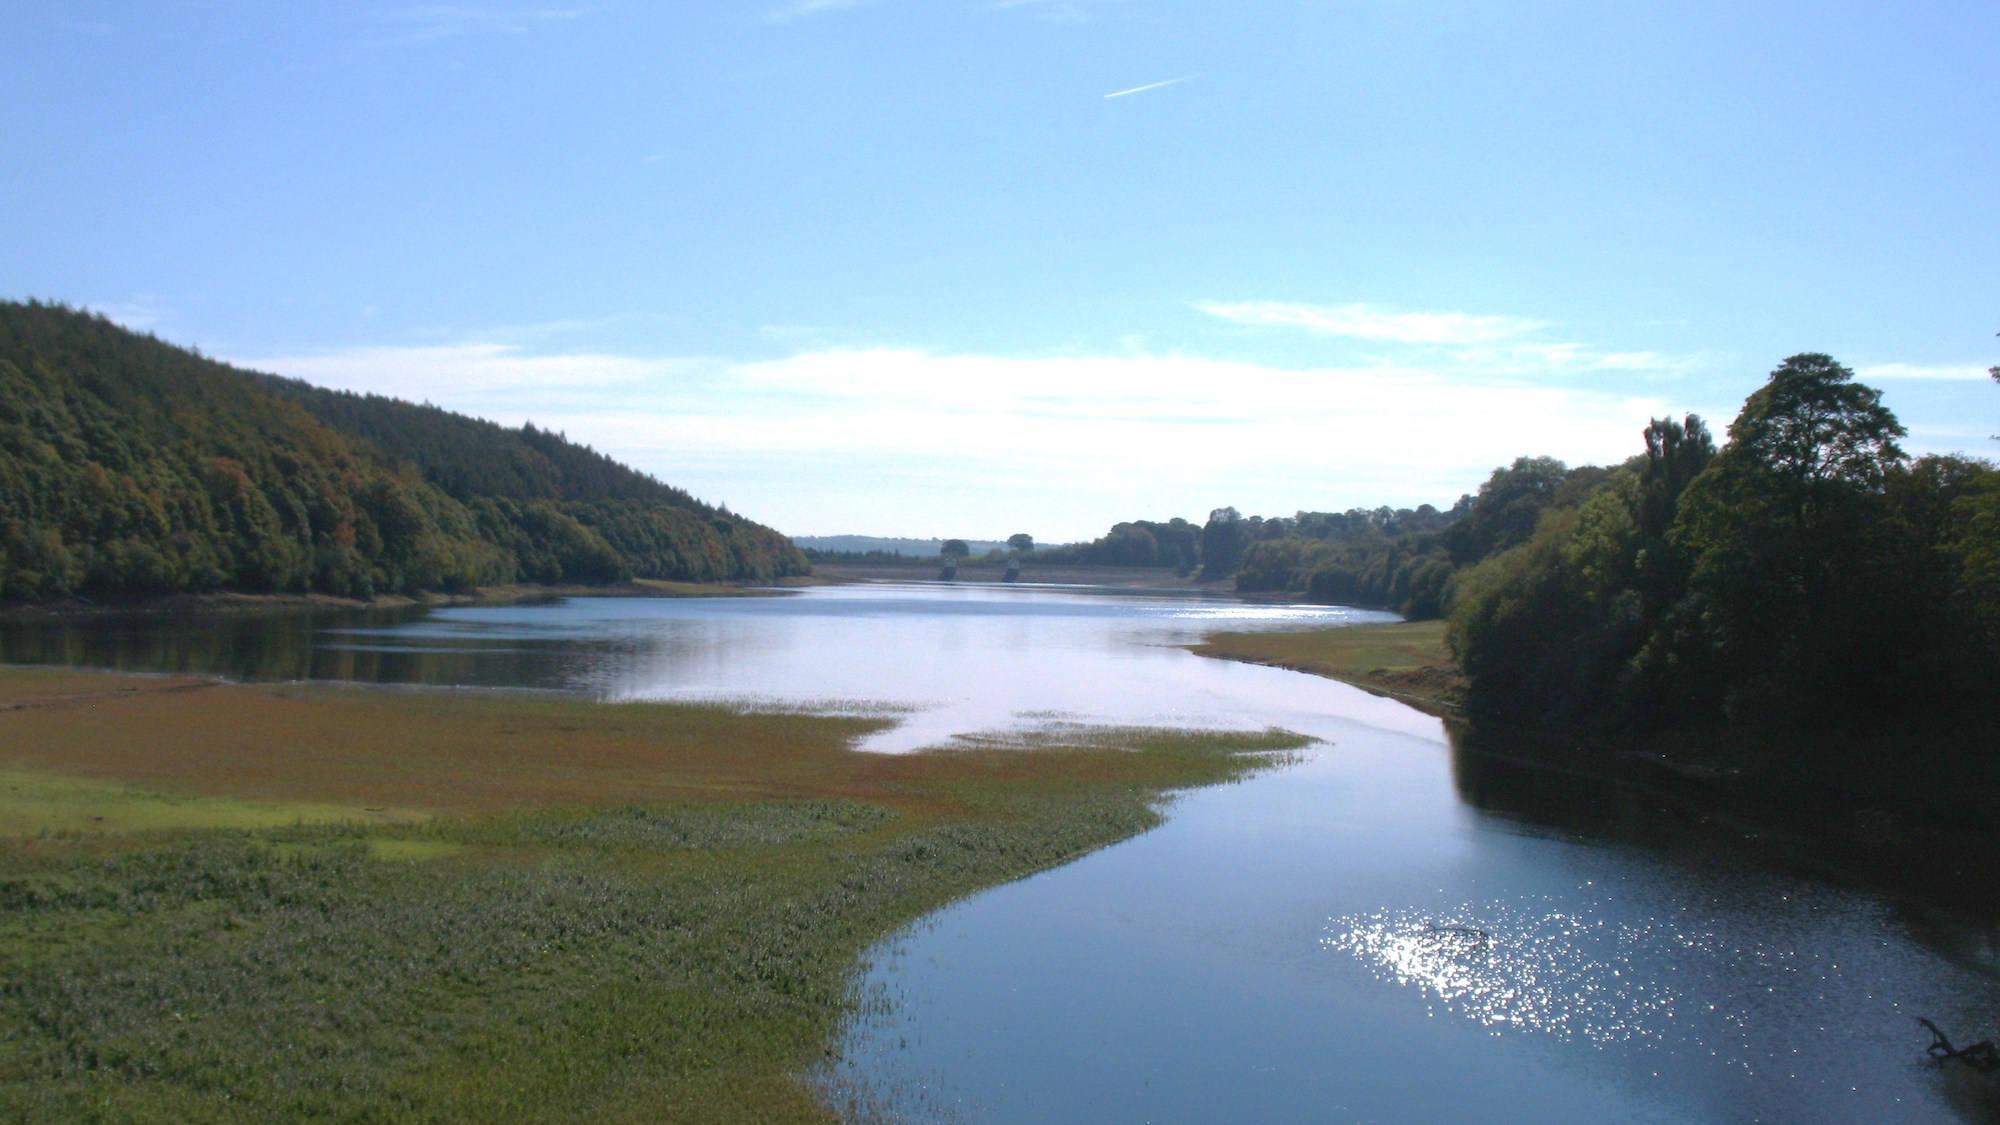 Lindley Wood Reservoir